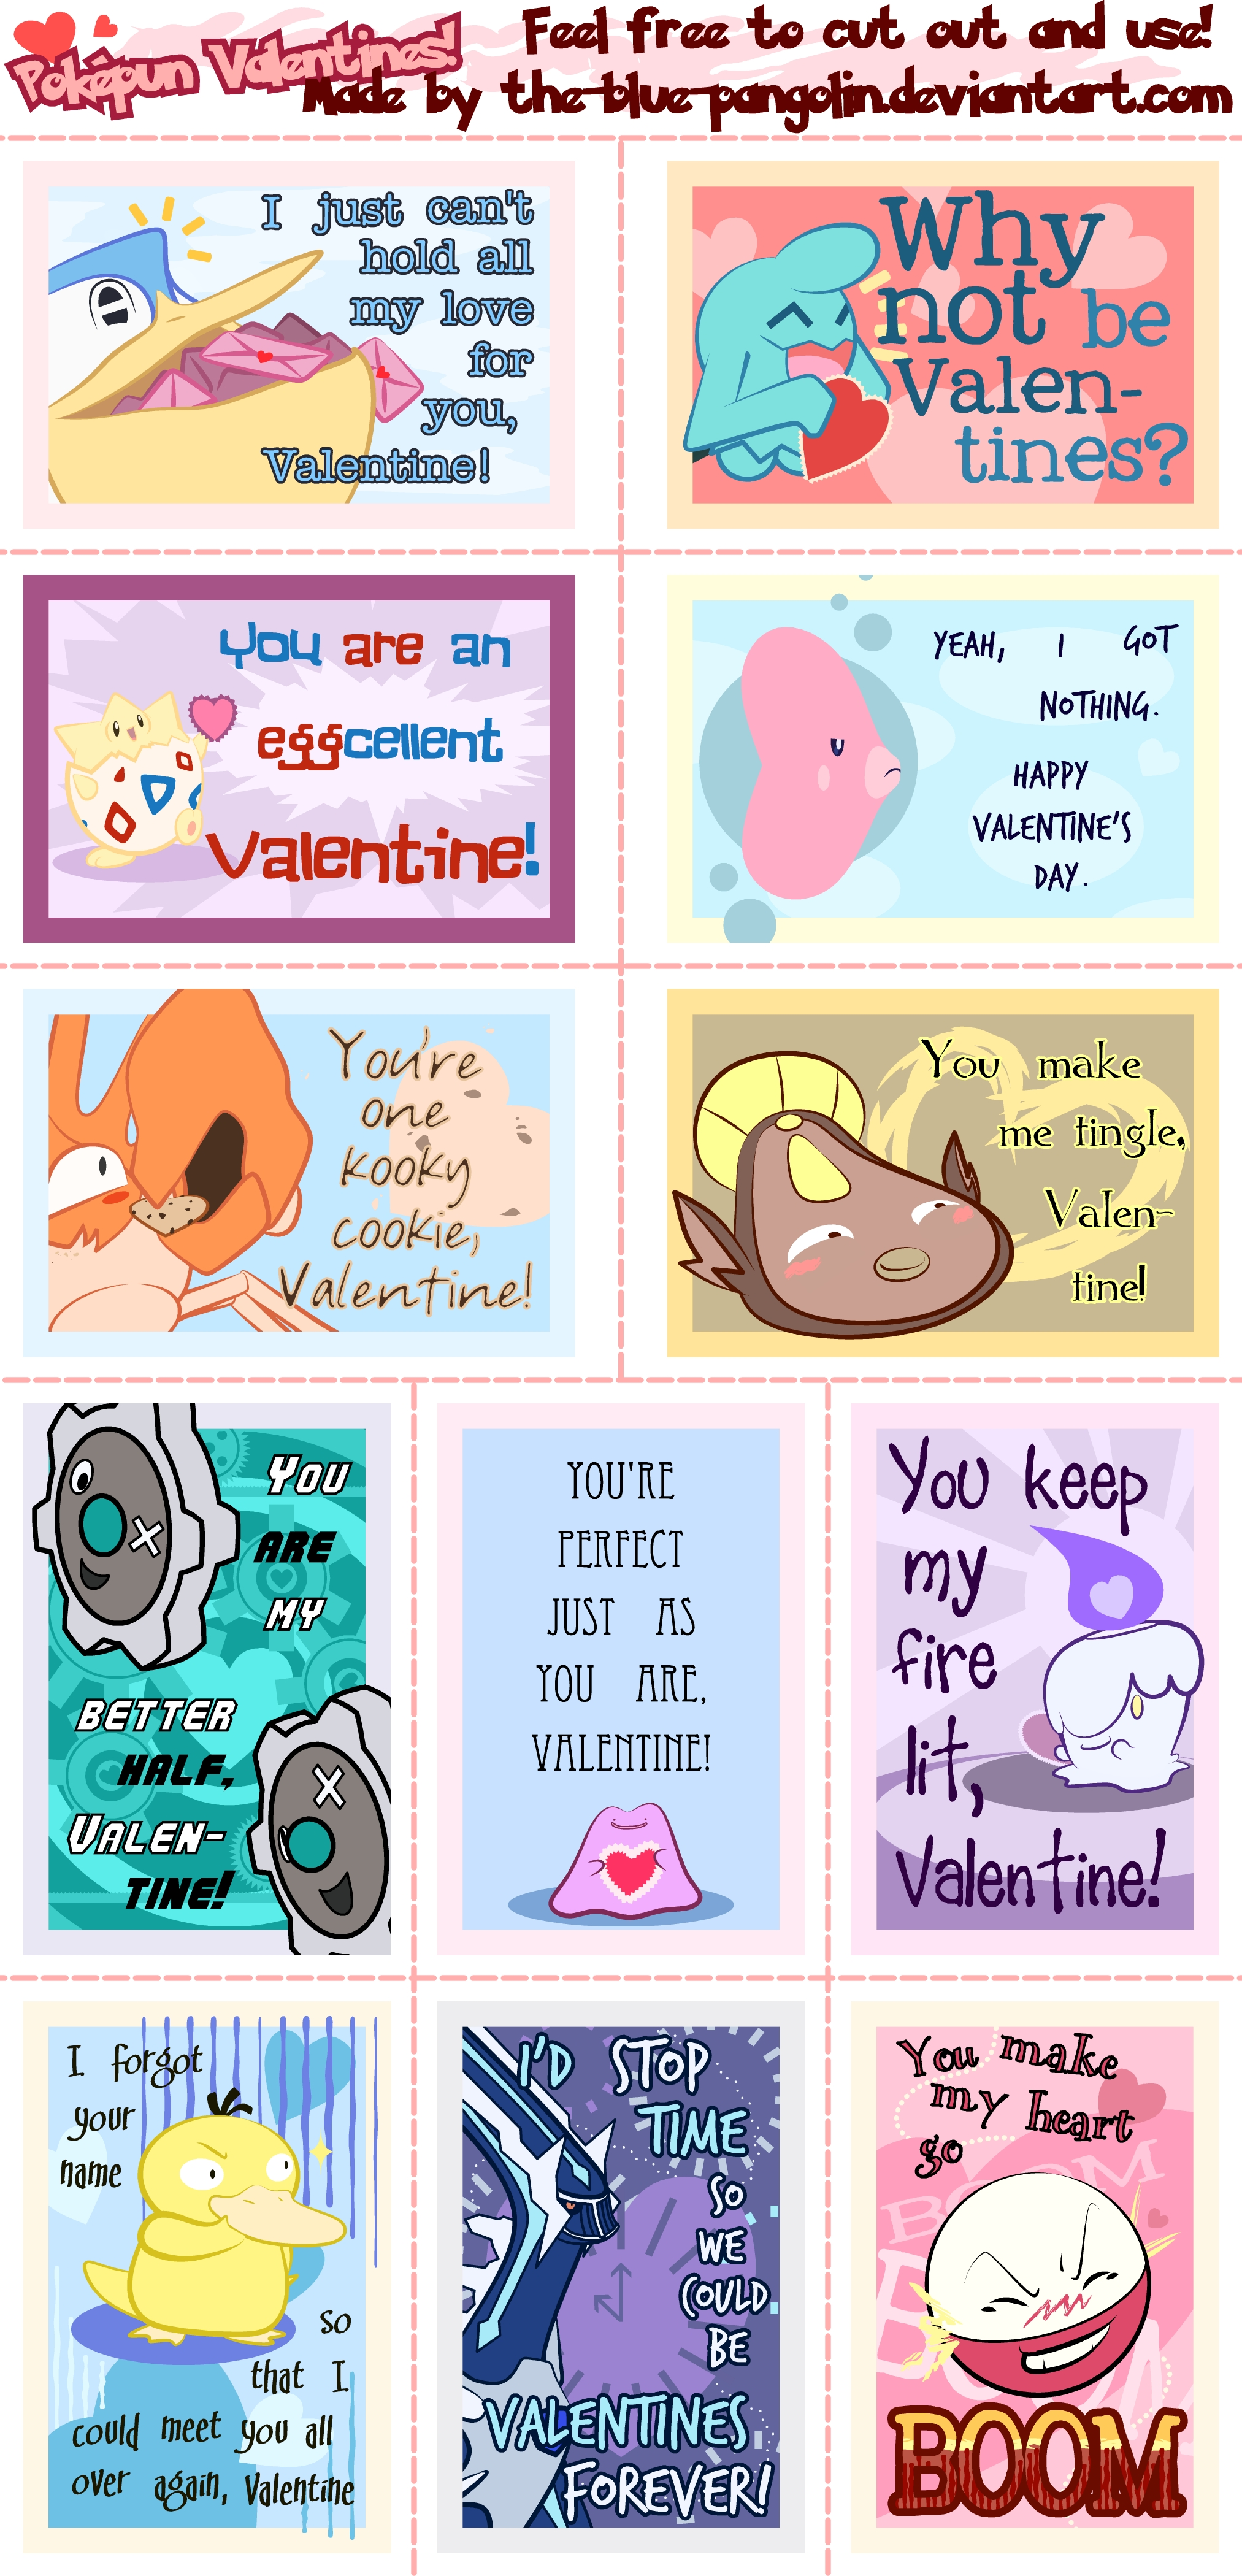 Pokemon Valentines 2013 by The-Blue-Pangolin on DeviantArt